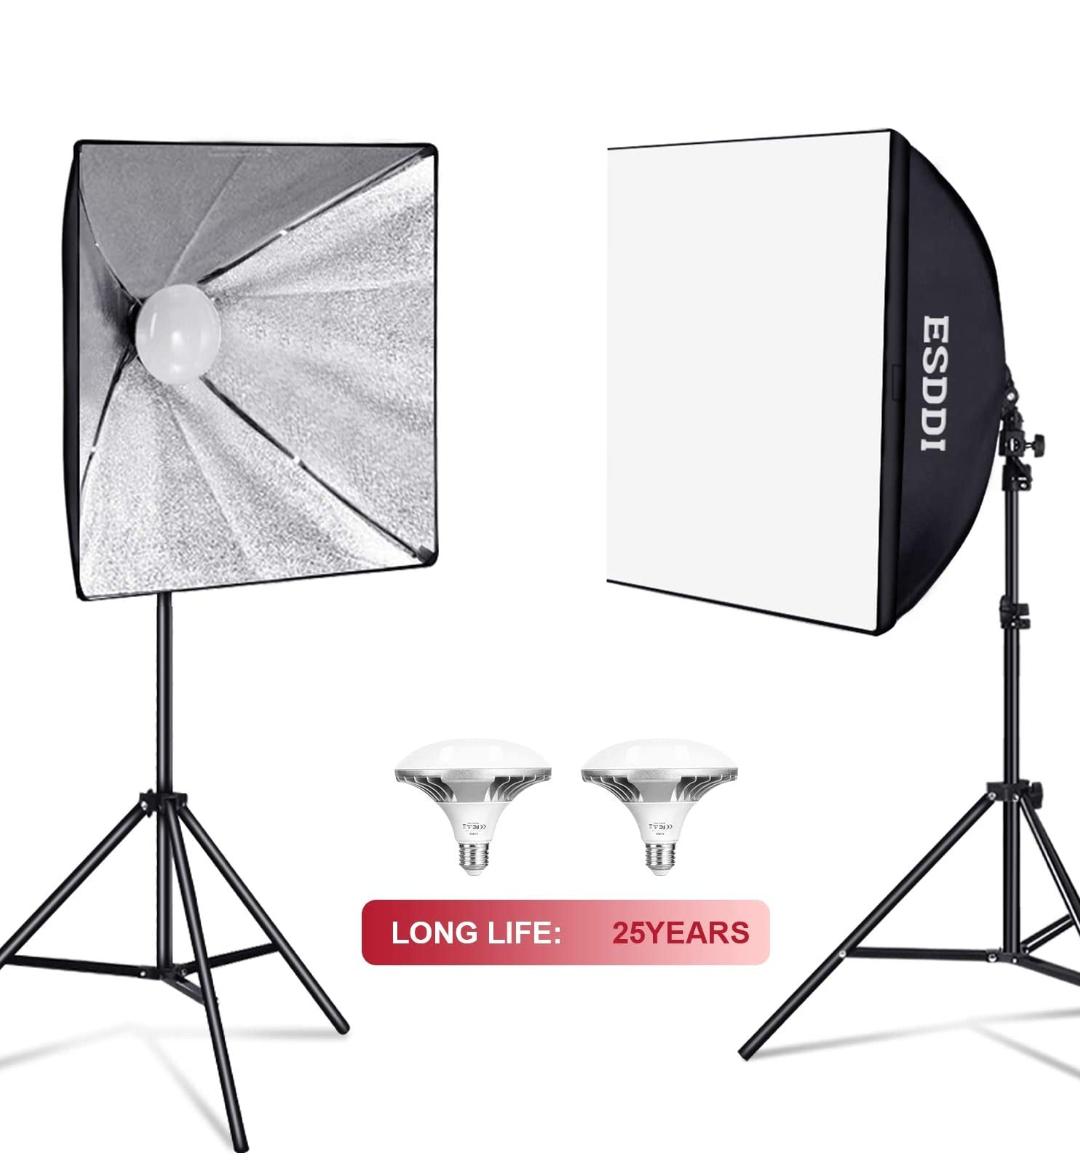 Kit con 2 Bombillas de Luz 900W, 2 Softbox 50x70cm, 2 Tripodes Luz Continua para Estudio Fotográfico